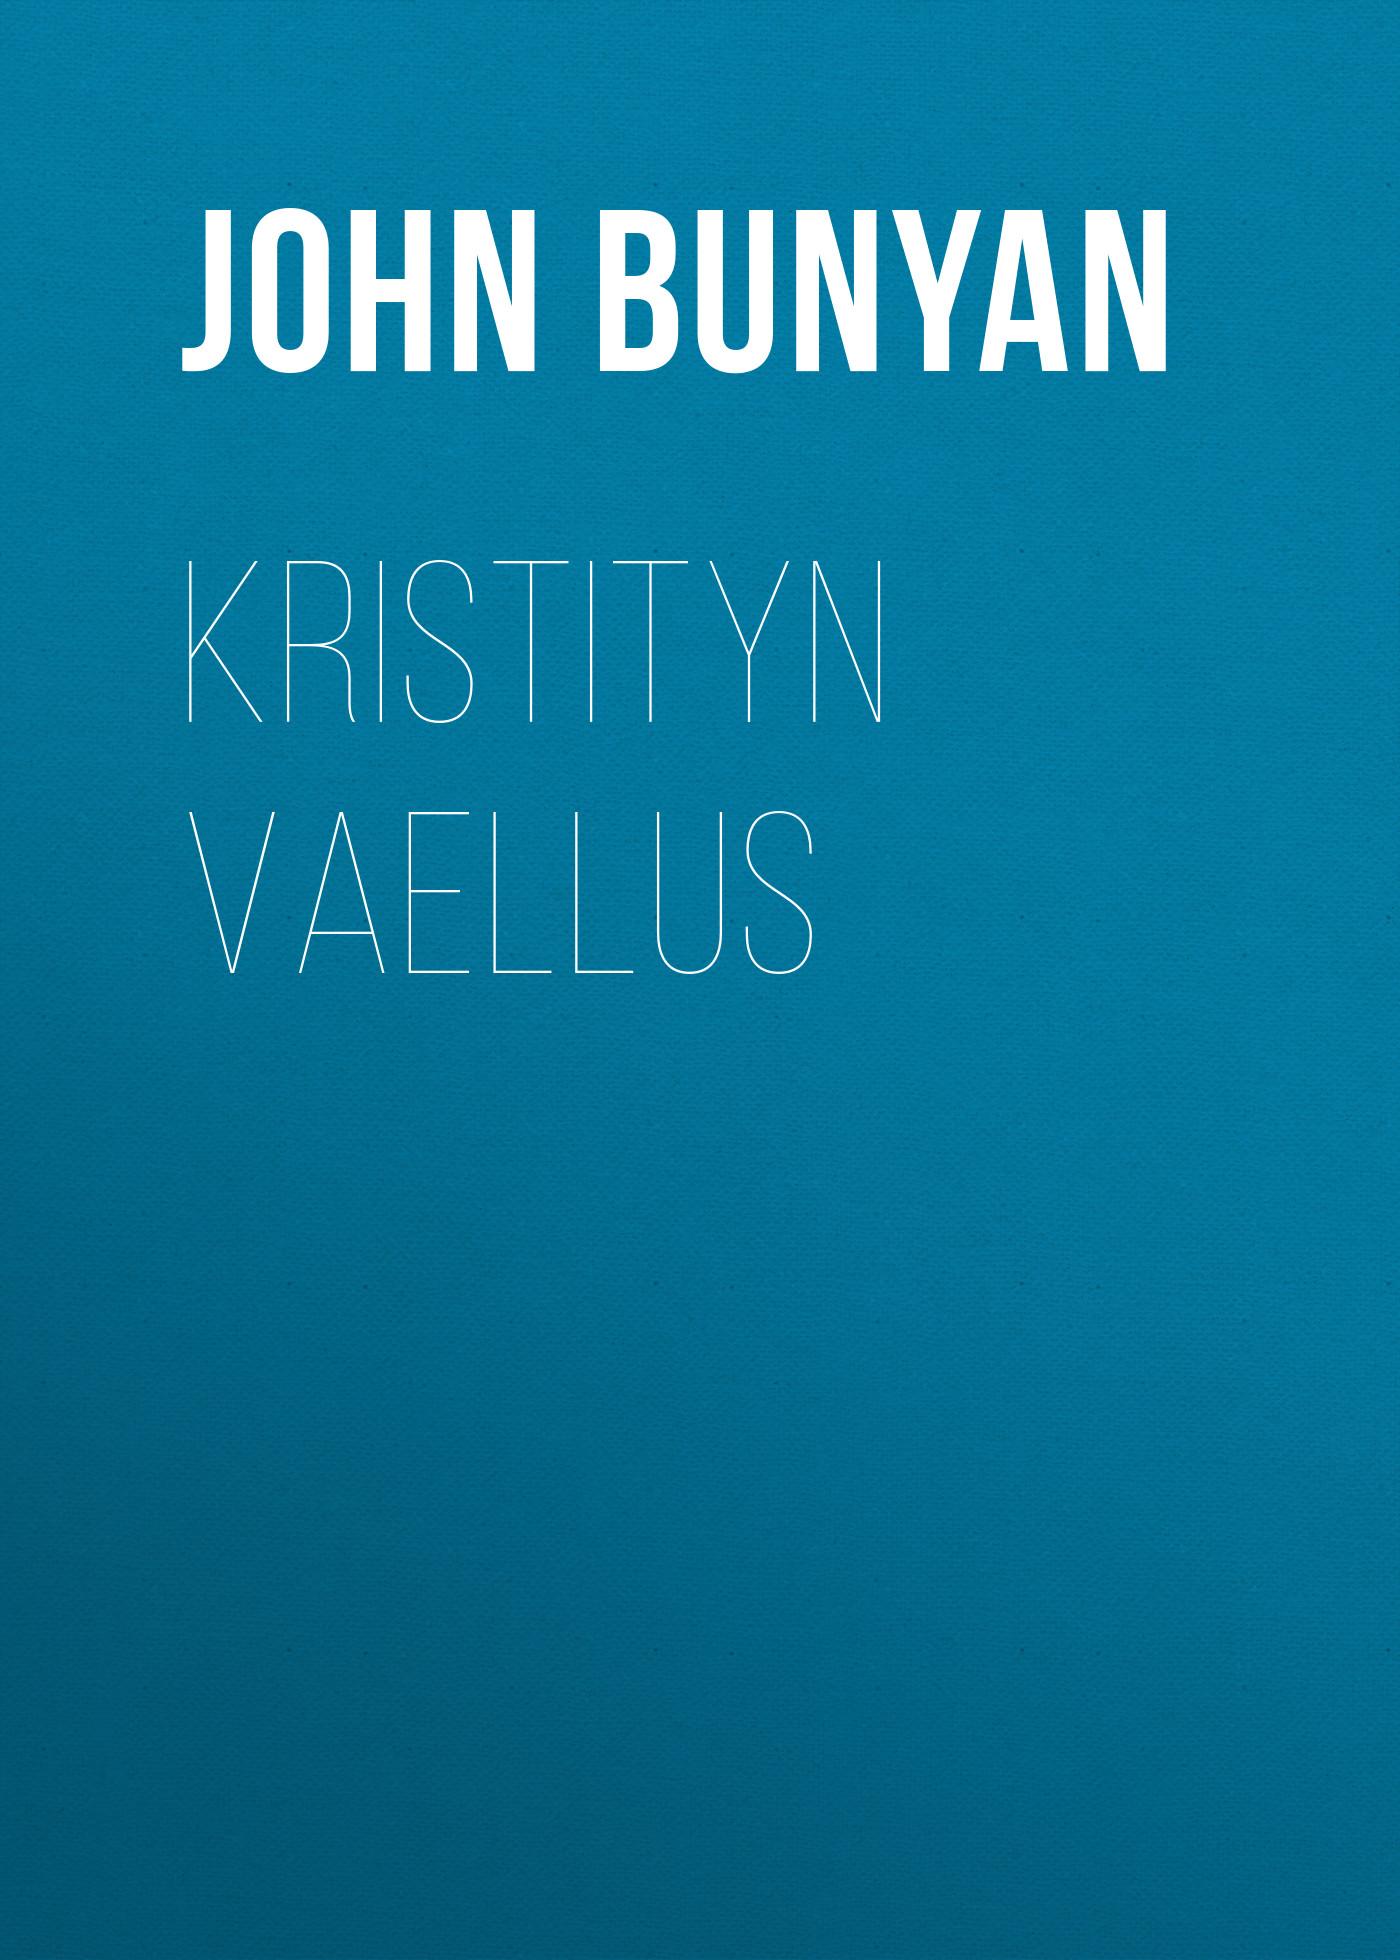 John Bunyan Kristityn vaellus гладильная система laurastar lift red eu